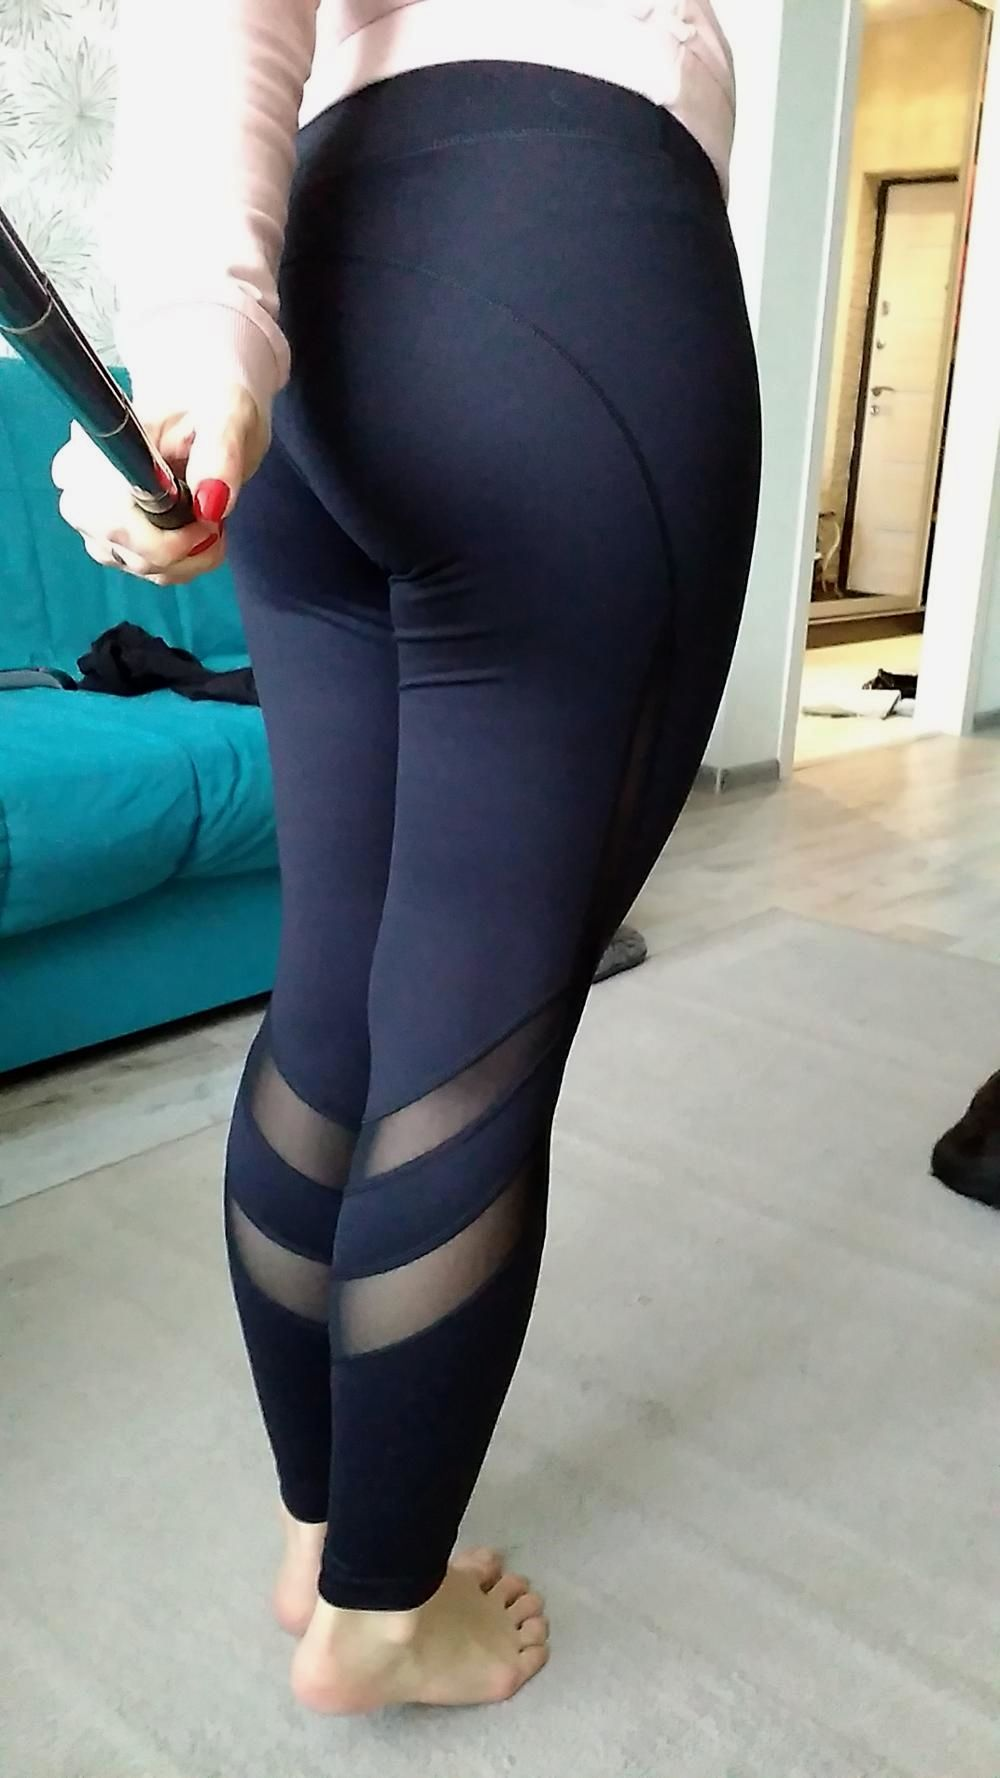 Sex tights lycra no abrasion